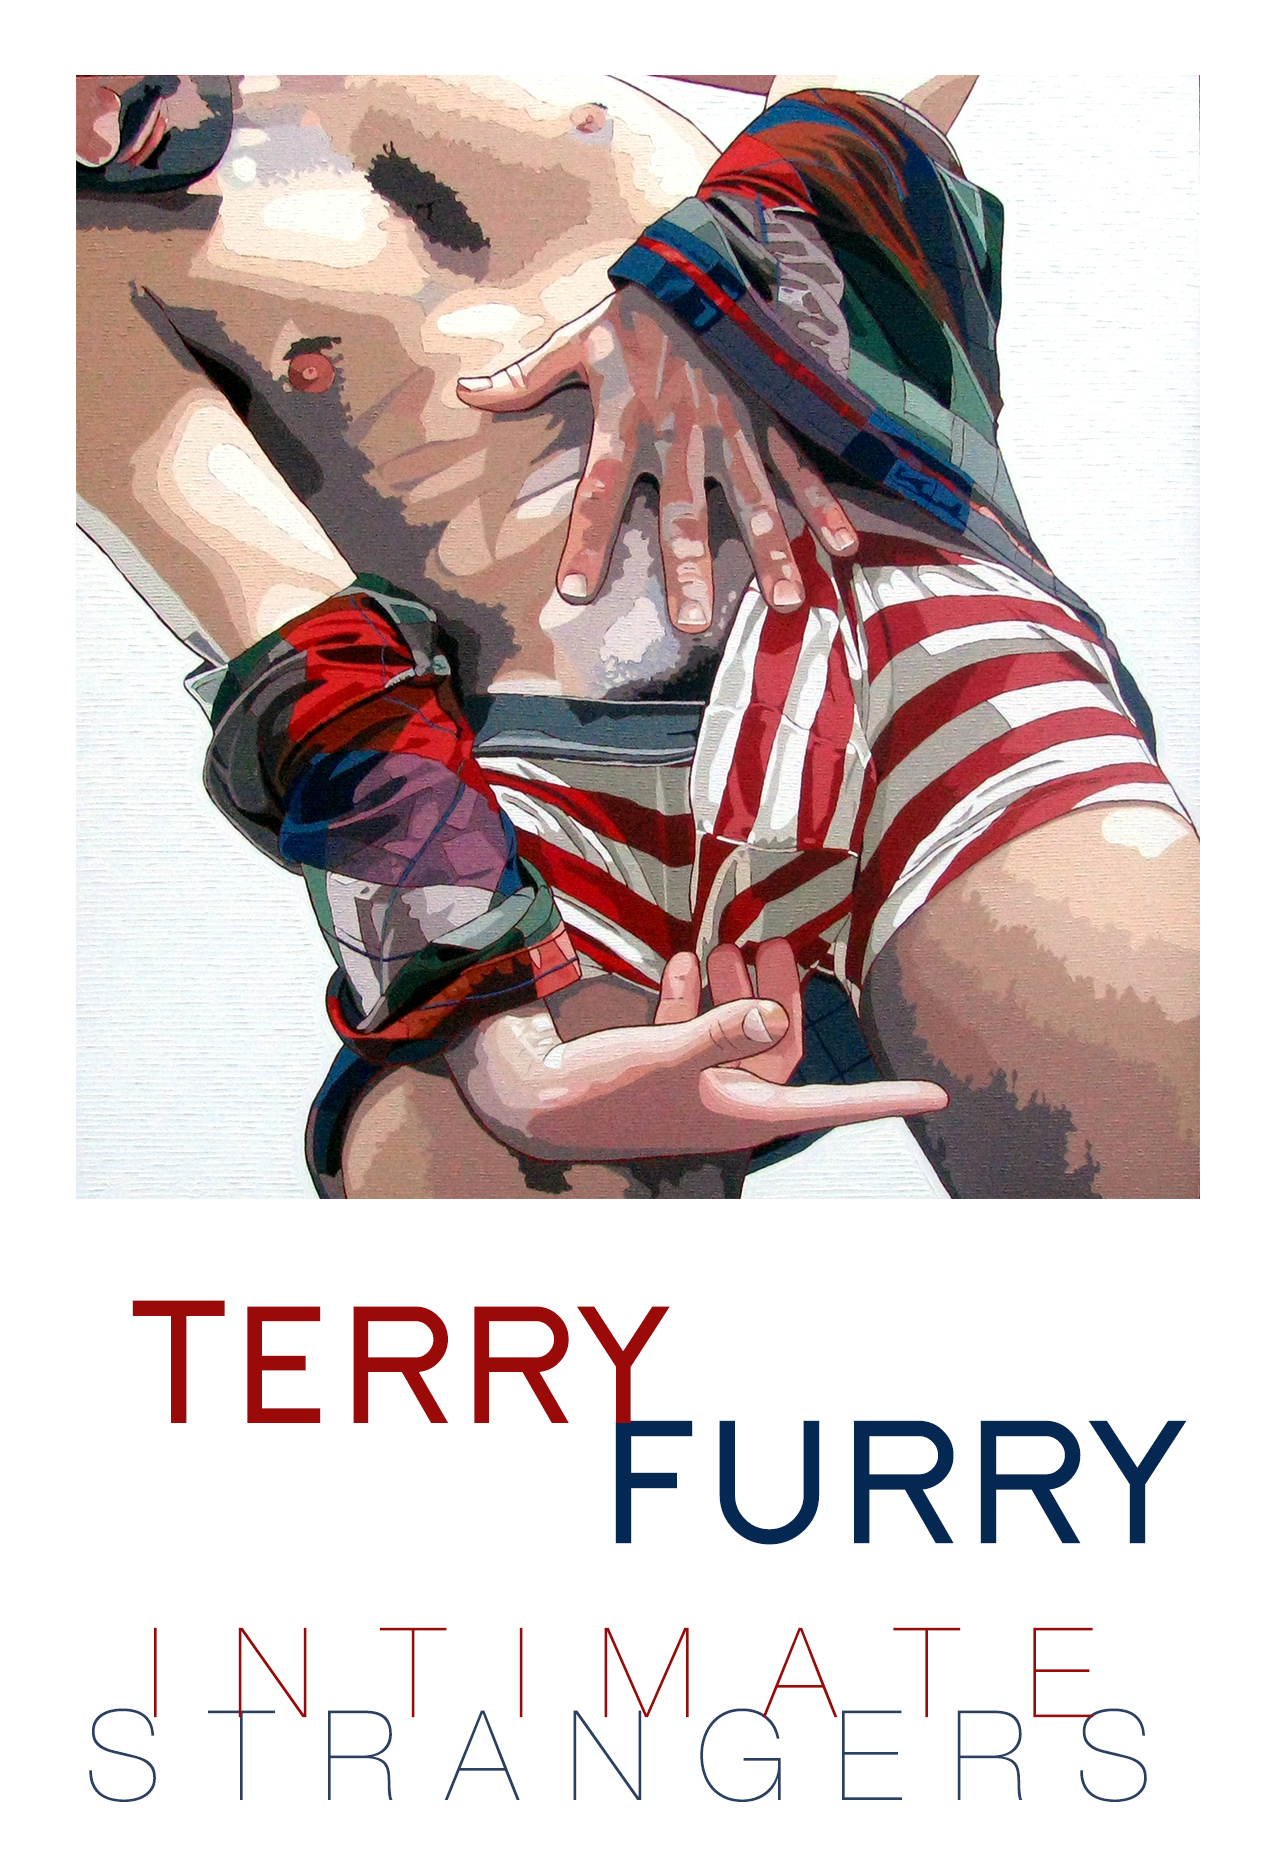 Terry-furry